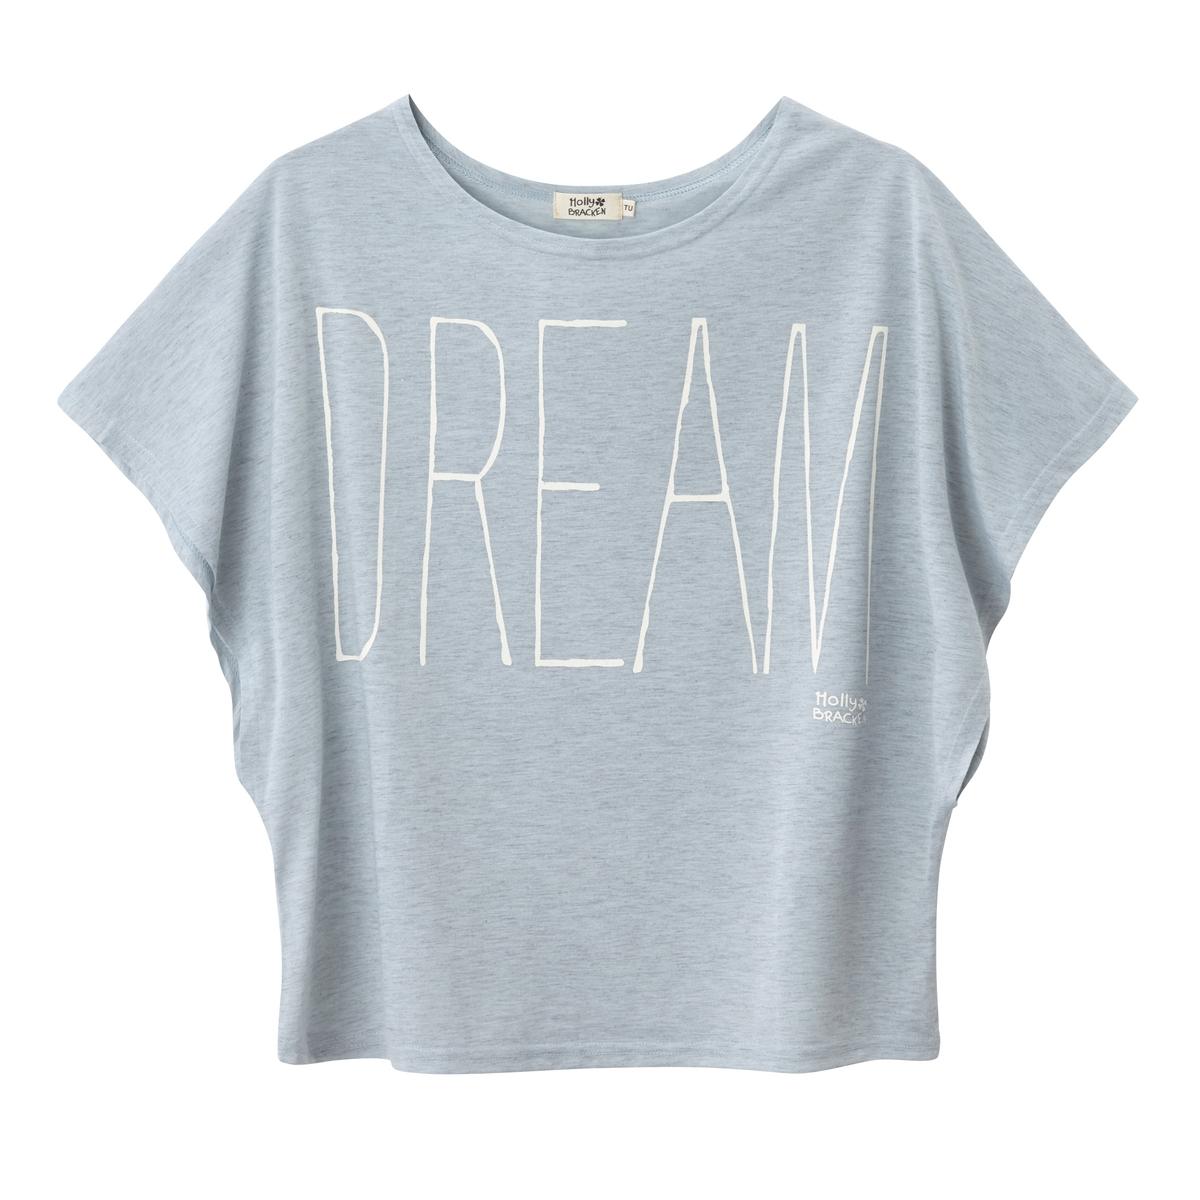 Футболка объемного покроя DreamМатериал : 100% полиэстер   Длина рукава : короткие рукава  Форма воротника : без воротника  Покрой футболки: любой  Рисунок : рисунок спереди<br><br>Цвет: розовая пудра,серый<br>Размер: S/M.S/M